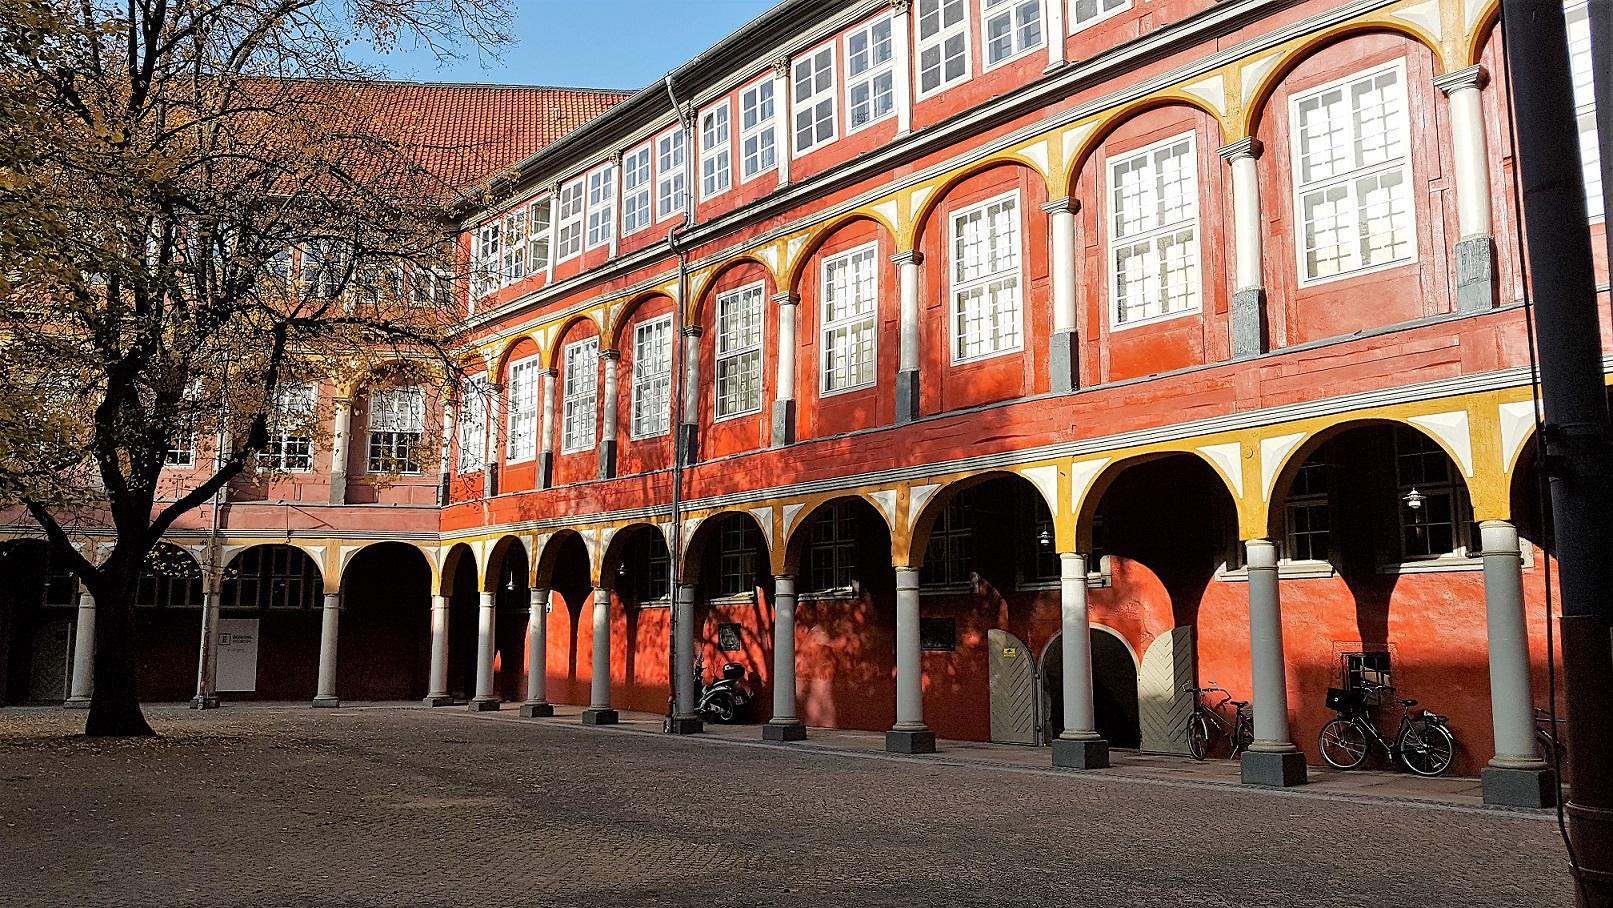 Innenhof des Wolfenbüttler Schlosses